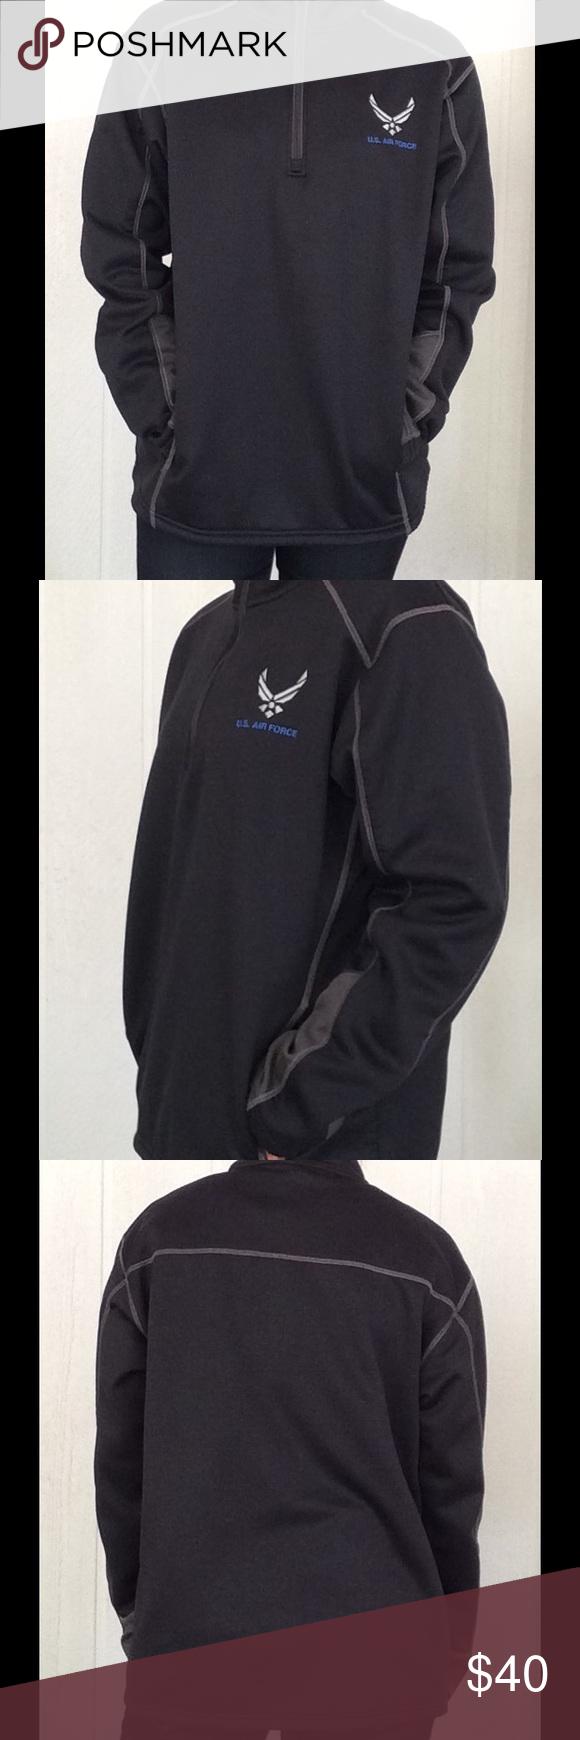 UNDER ARMOUR HOODIE EUC Pullover style sweatshirt